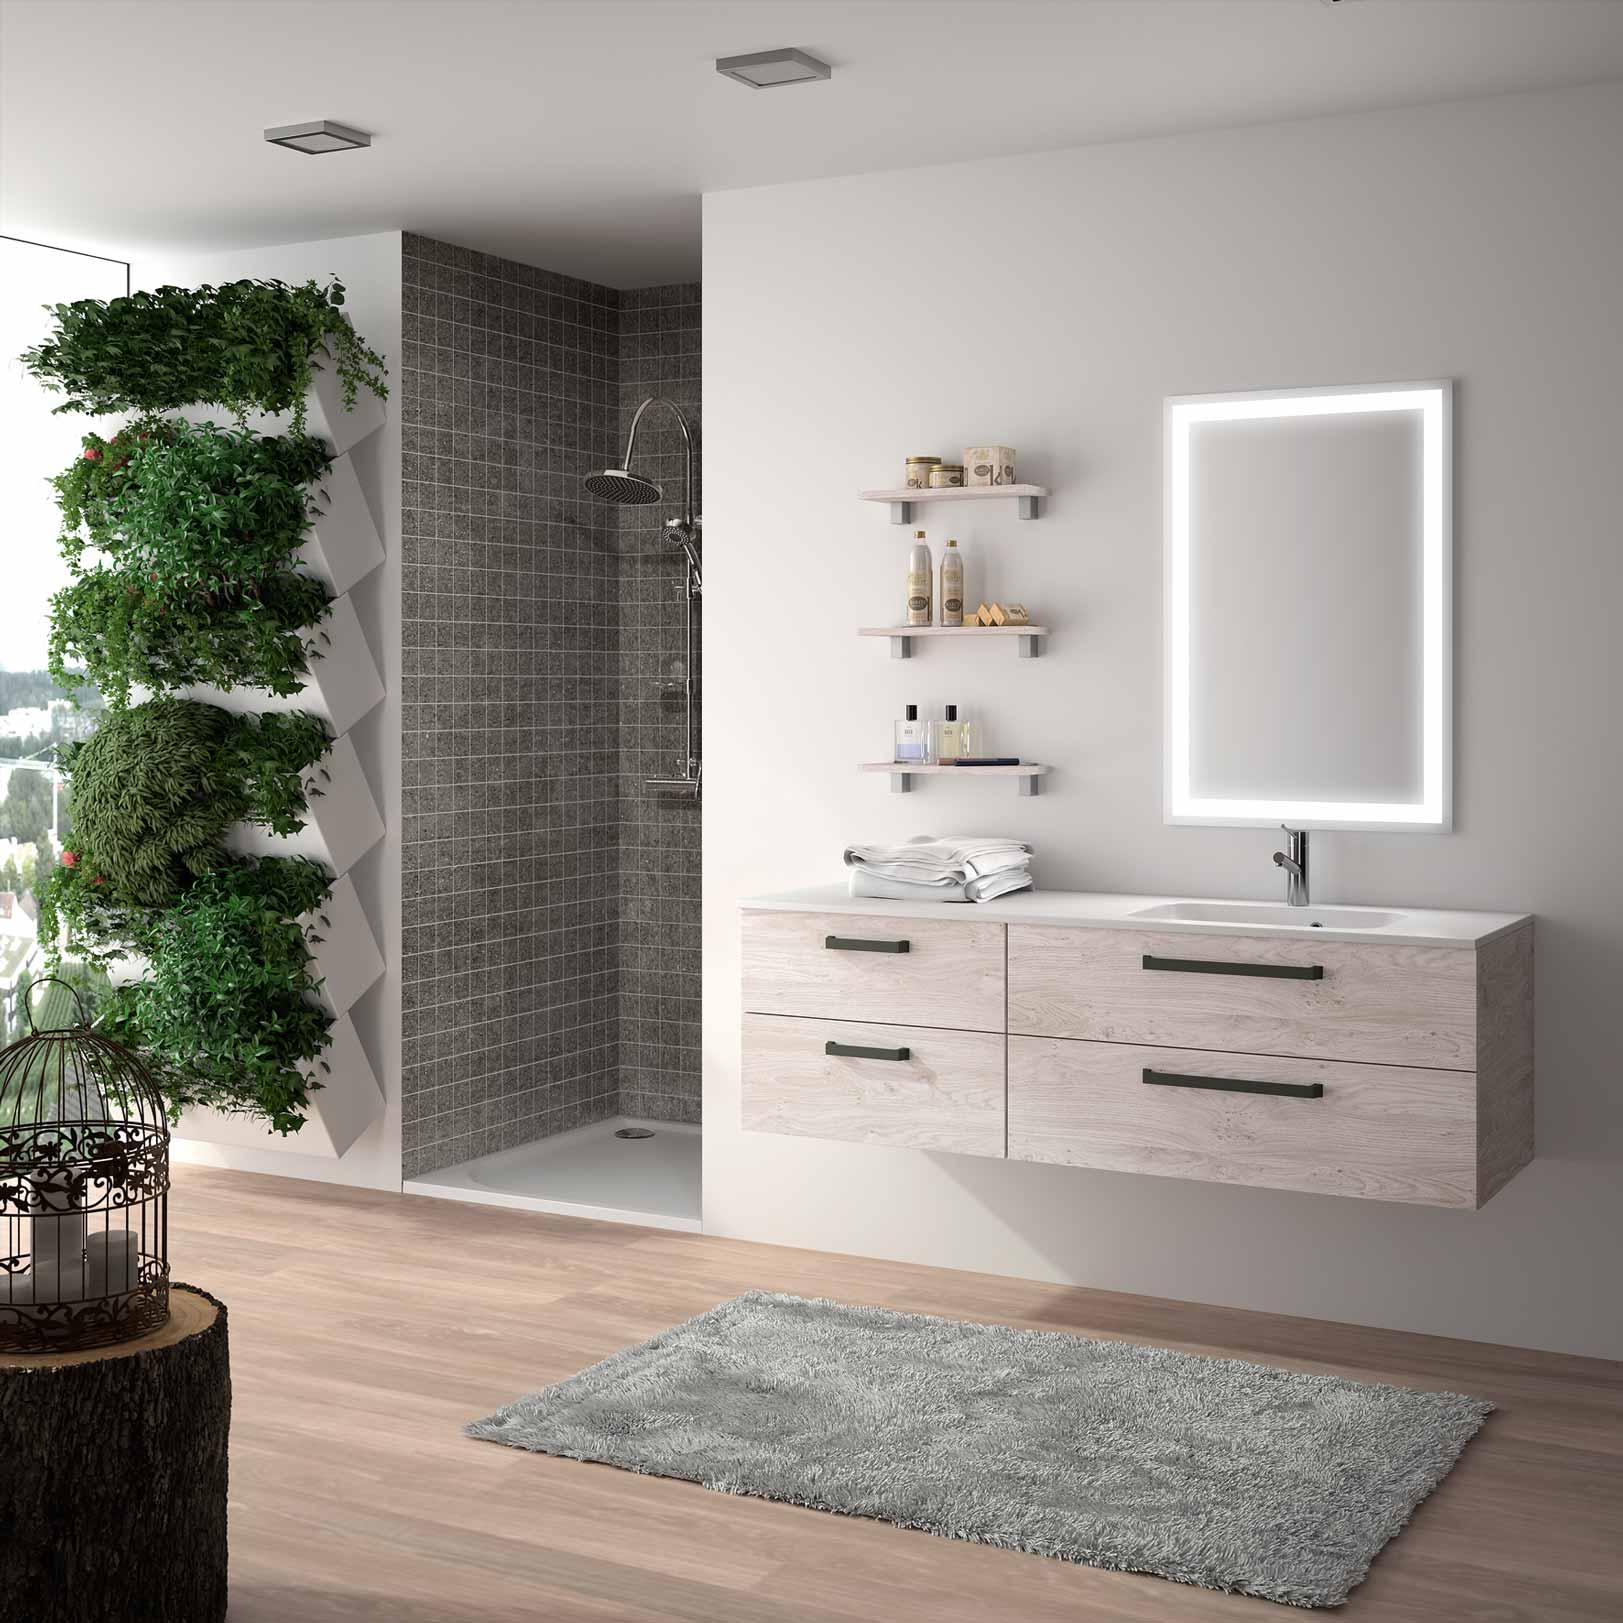 zo meubles de salle de bains baignoires fabricant fran ais cedam. Black Bedroom Furniture Sets. Home Design Ideas